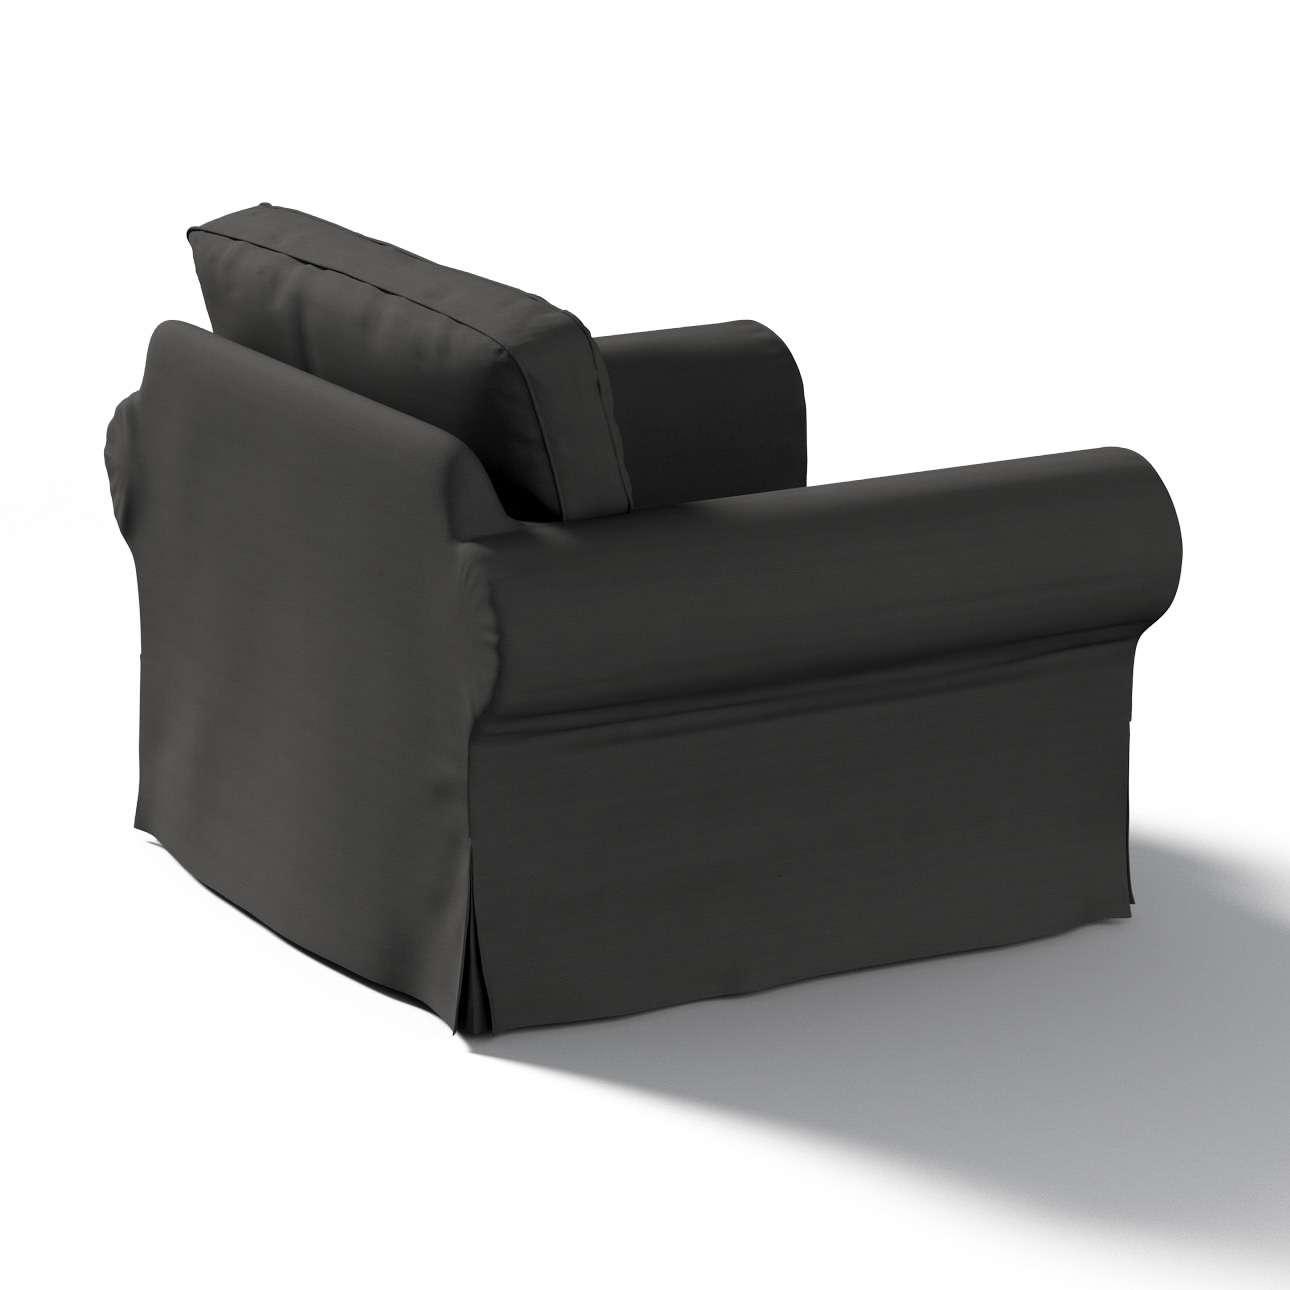 Potah na křeslo IKEA Ektorp kØeslo Ektorp v kolekci Cotton Panama, látka: 702-08